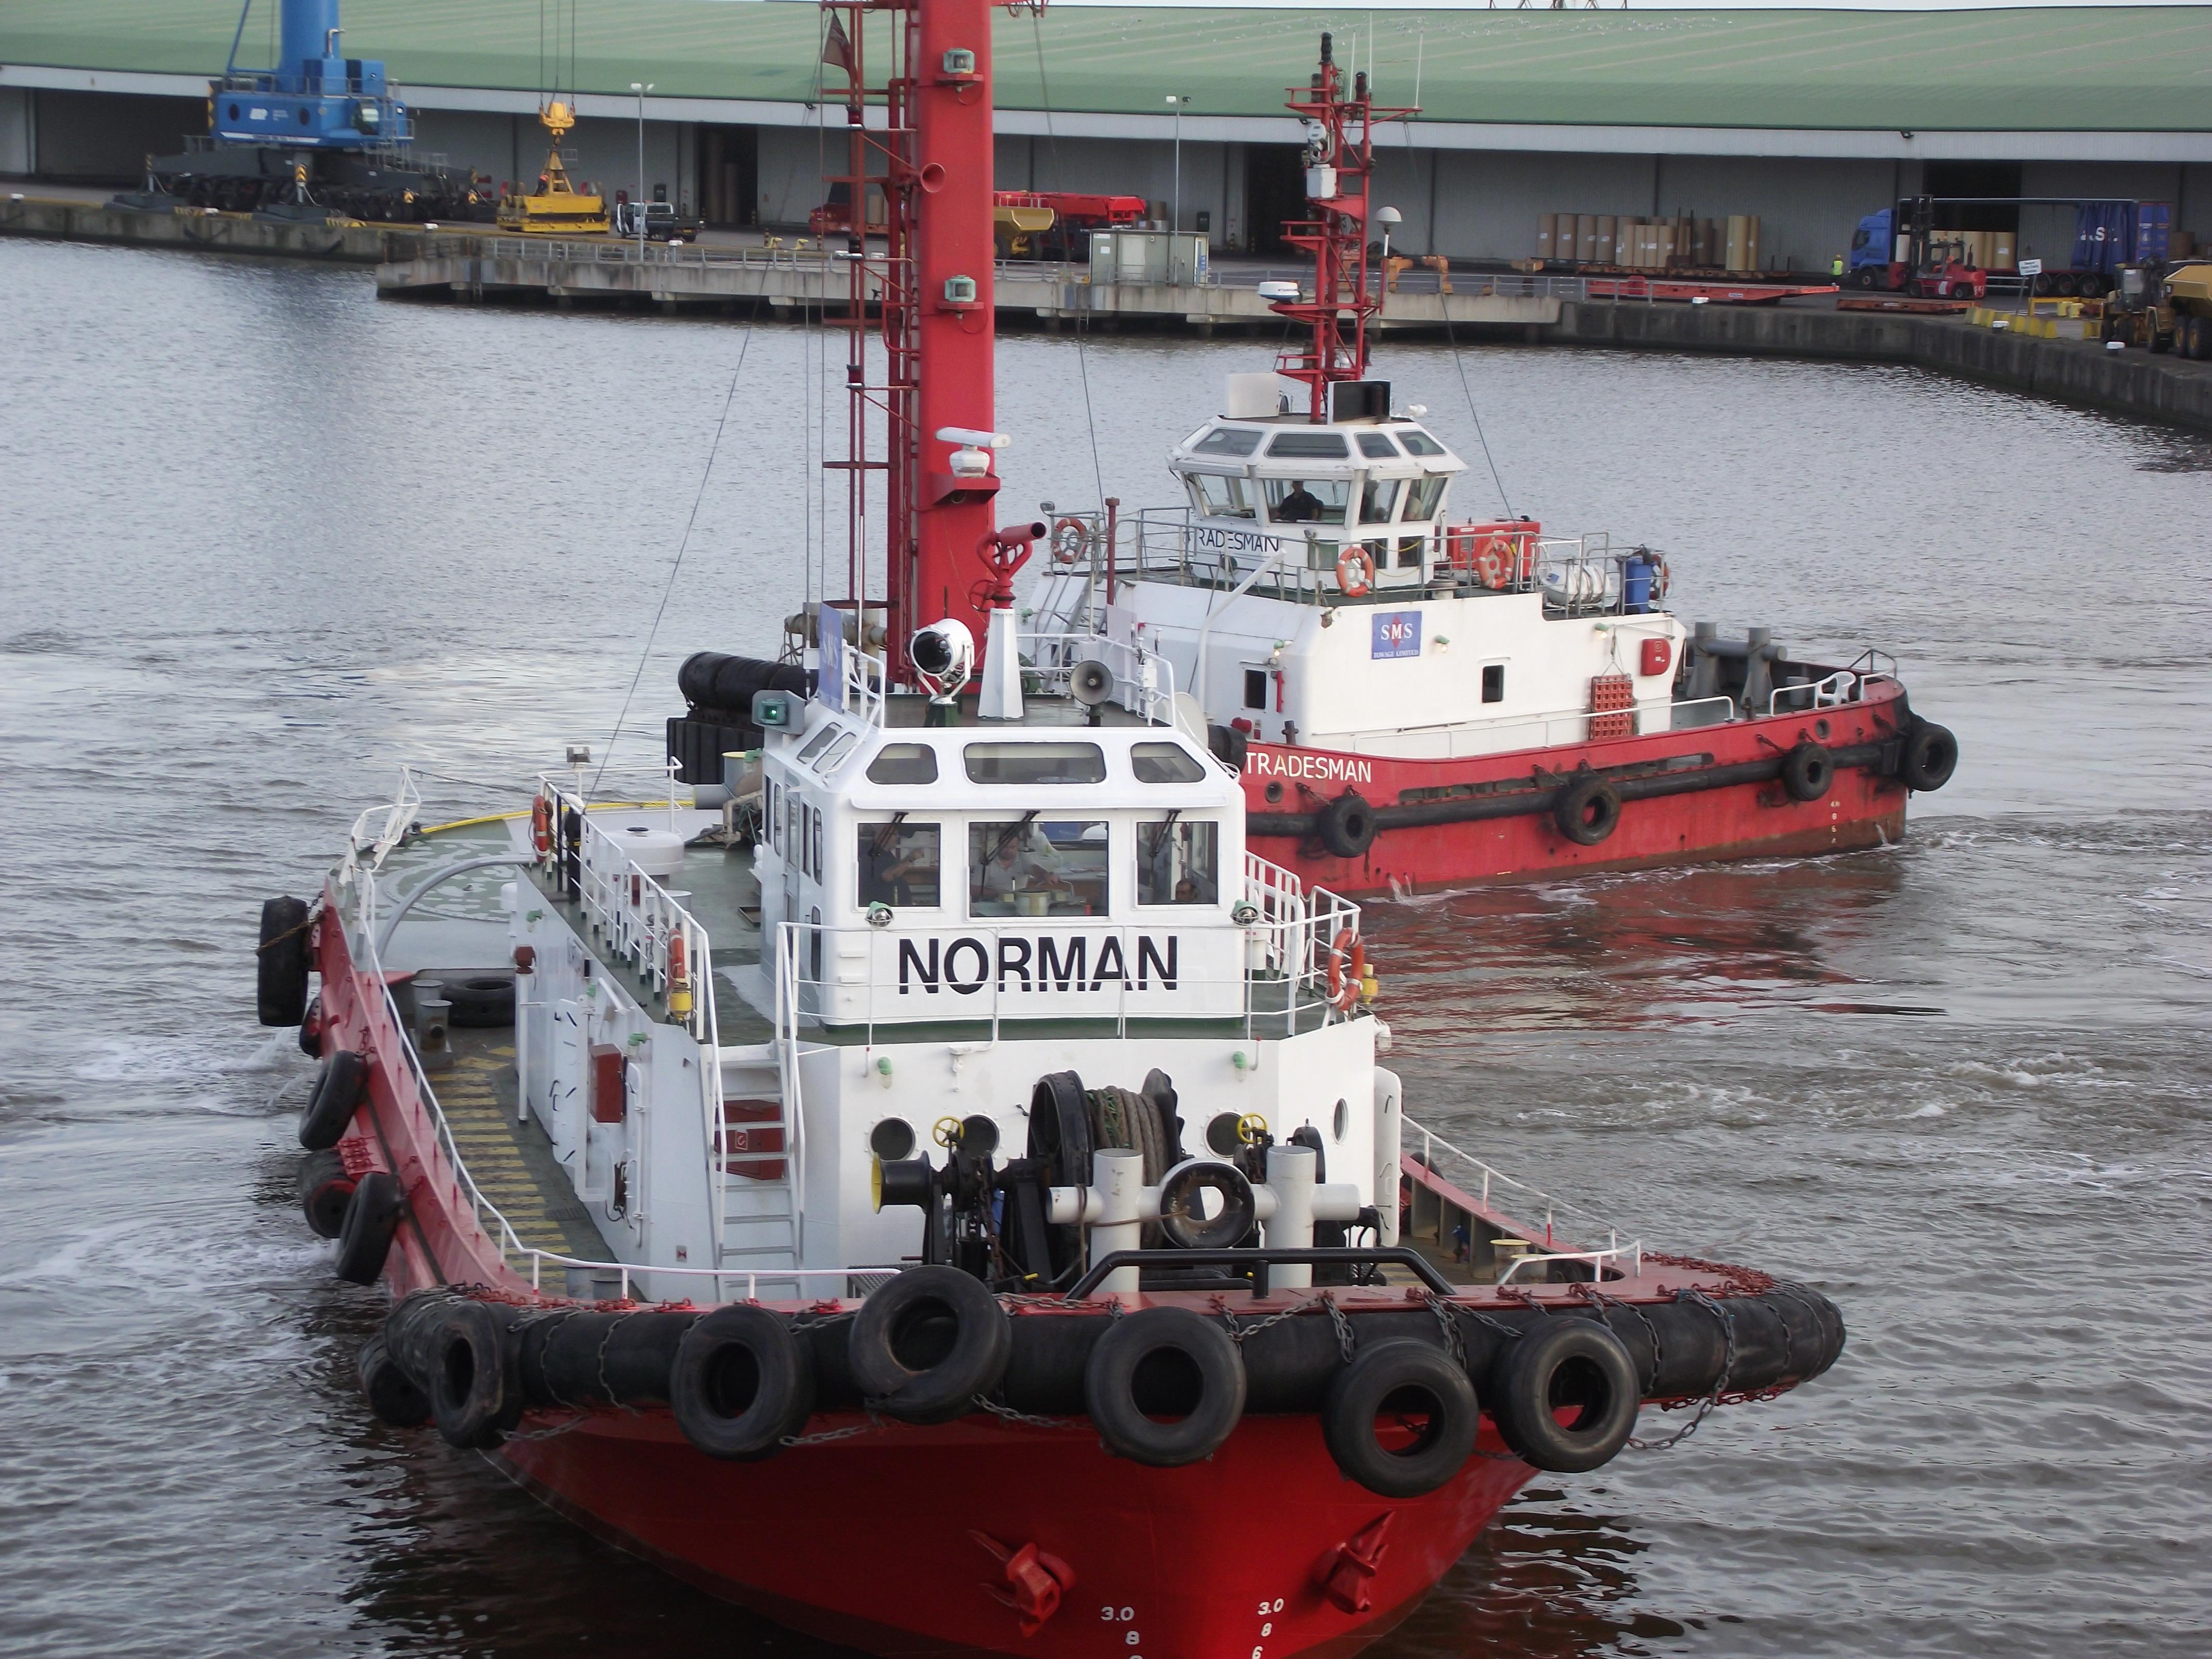 Two Tug boats, 2012, Boat, Dawn, England, HQ Photo